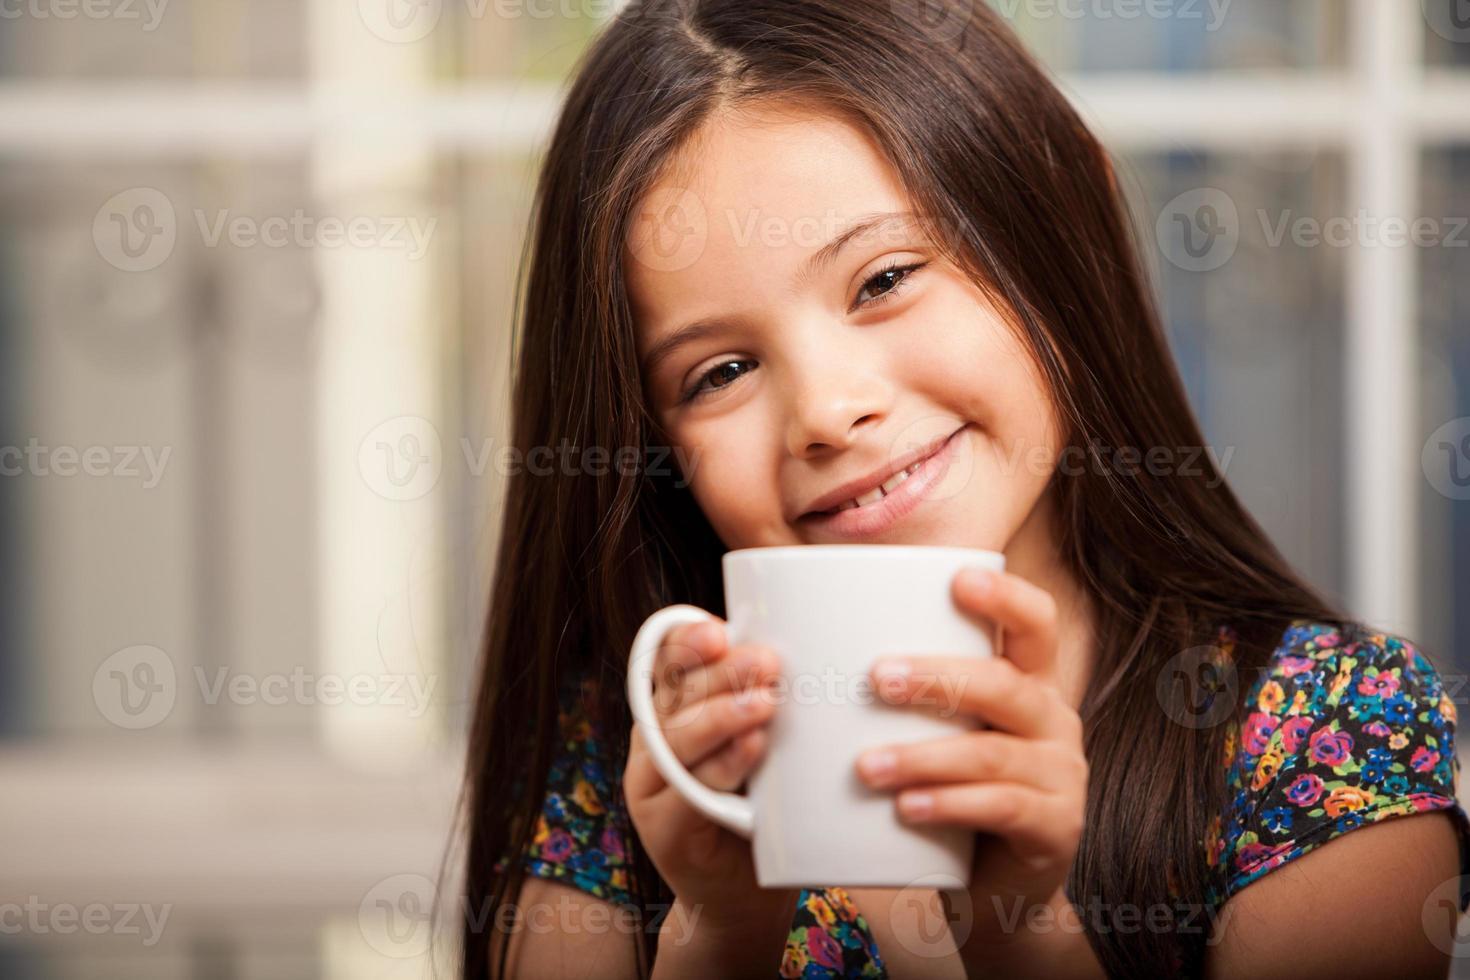 niña feliz bebiendo chocolate foto